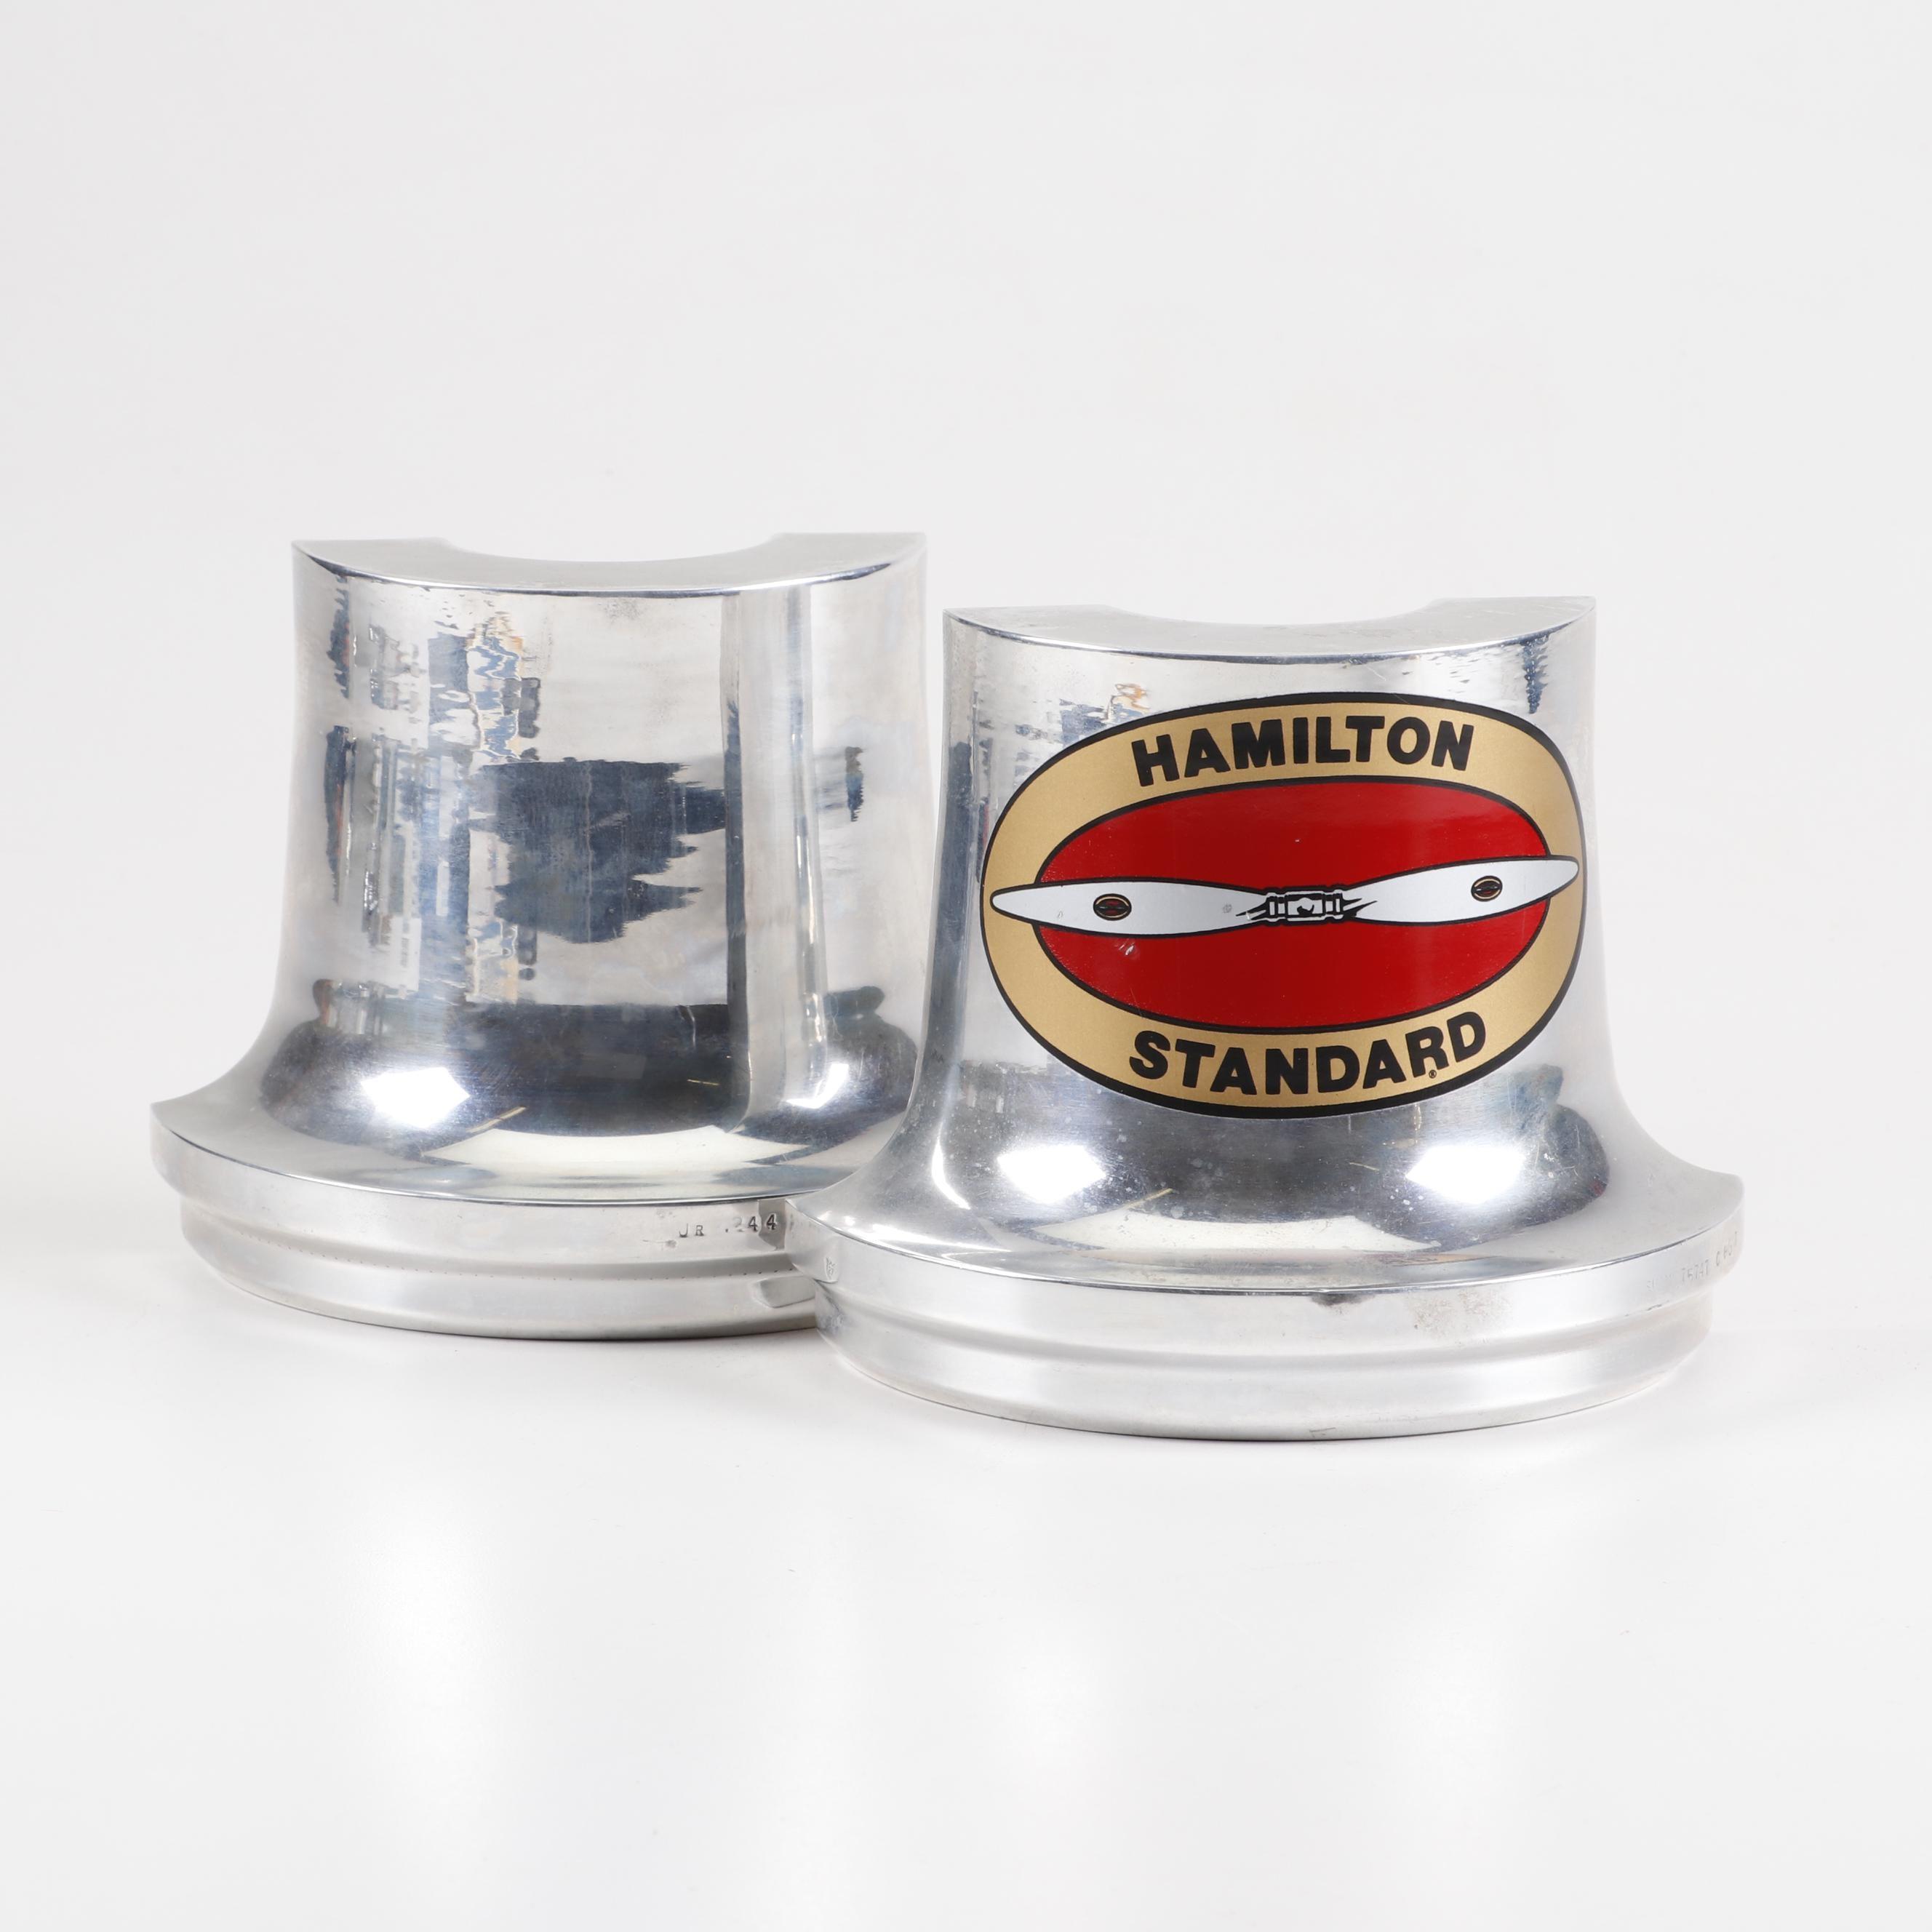 Hamilton Standard Propellor Company Metal Bookends